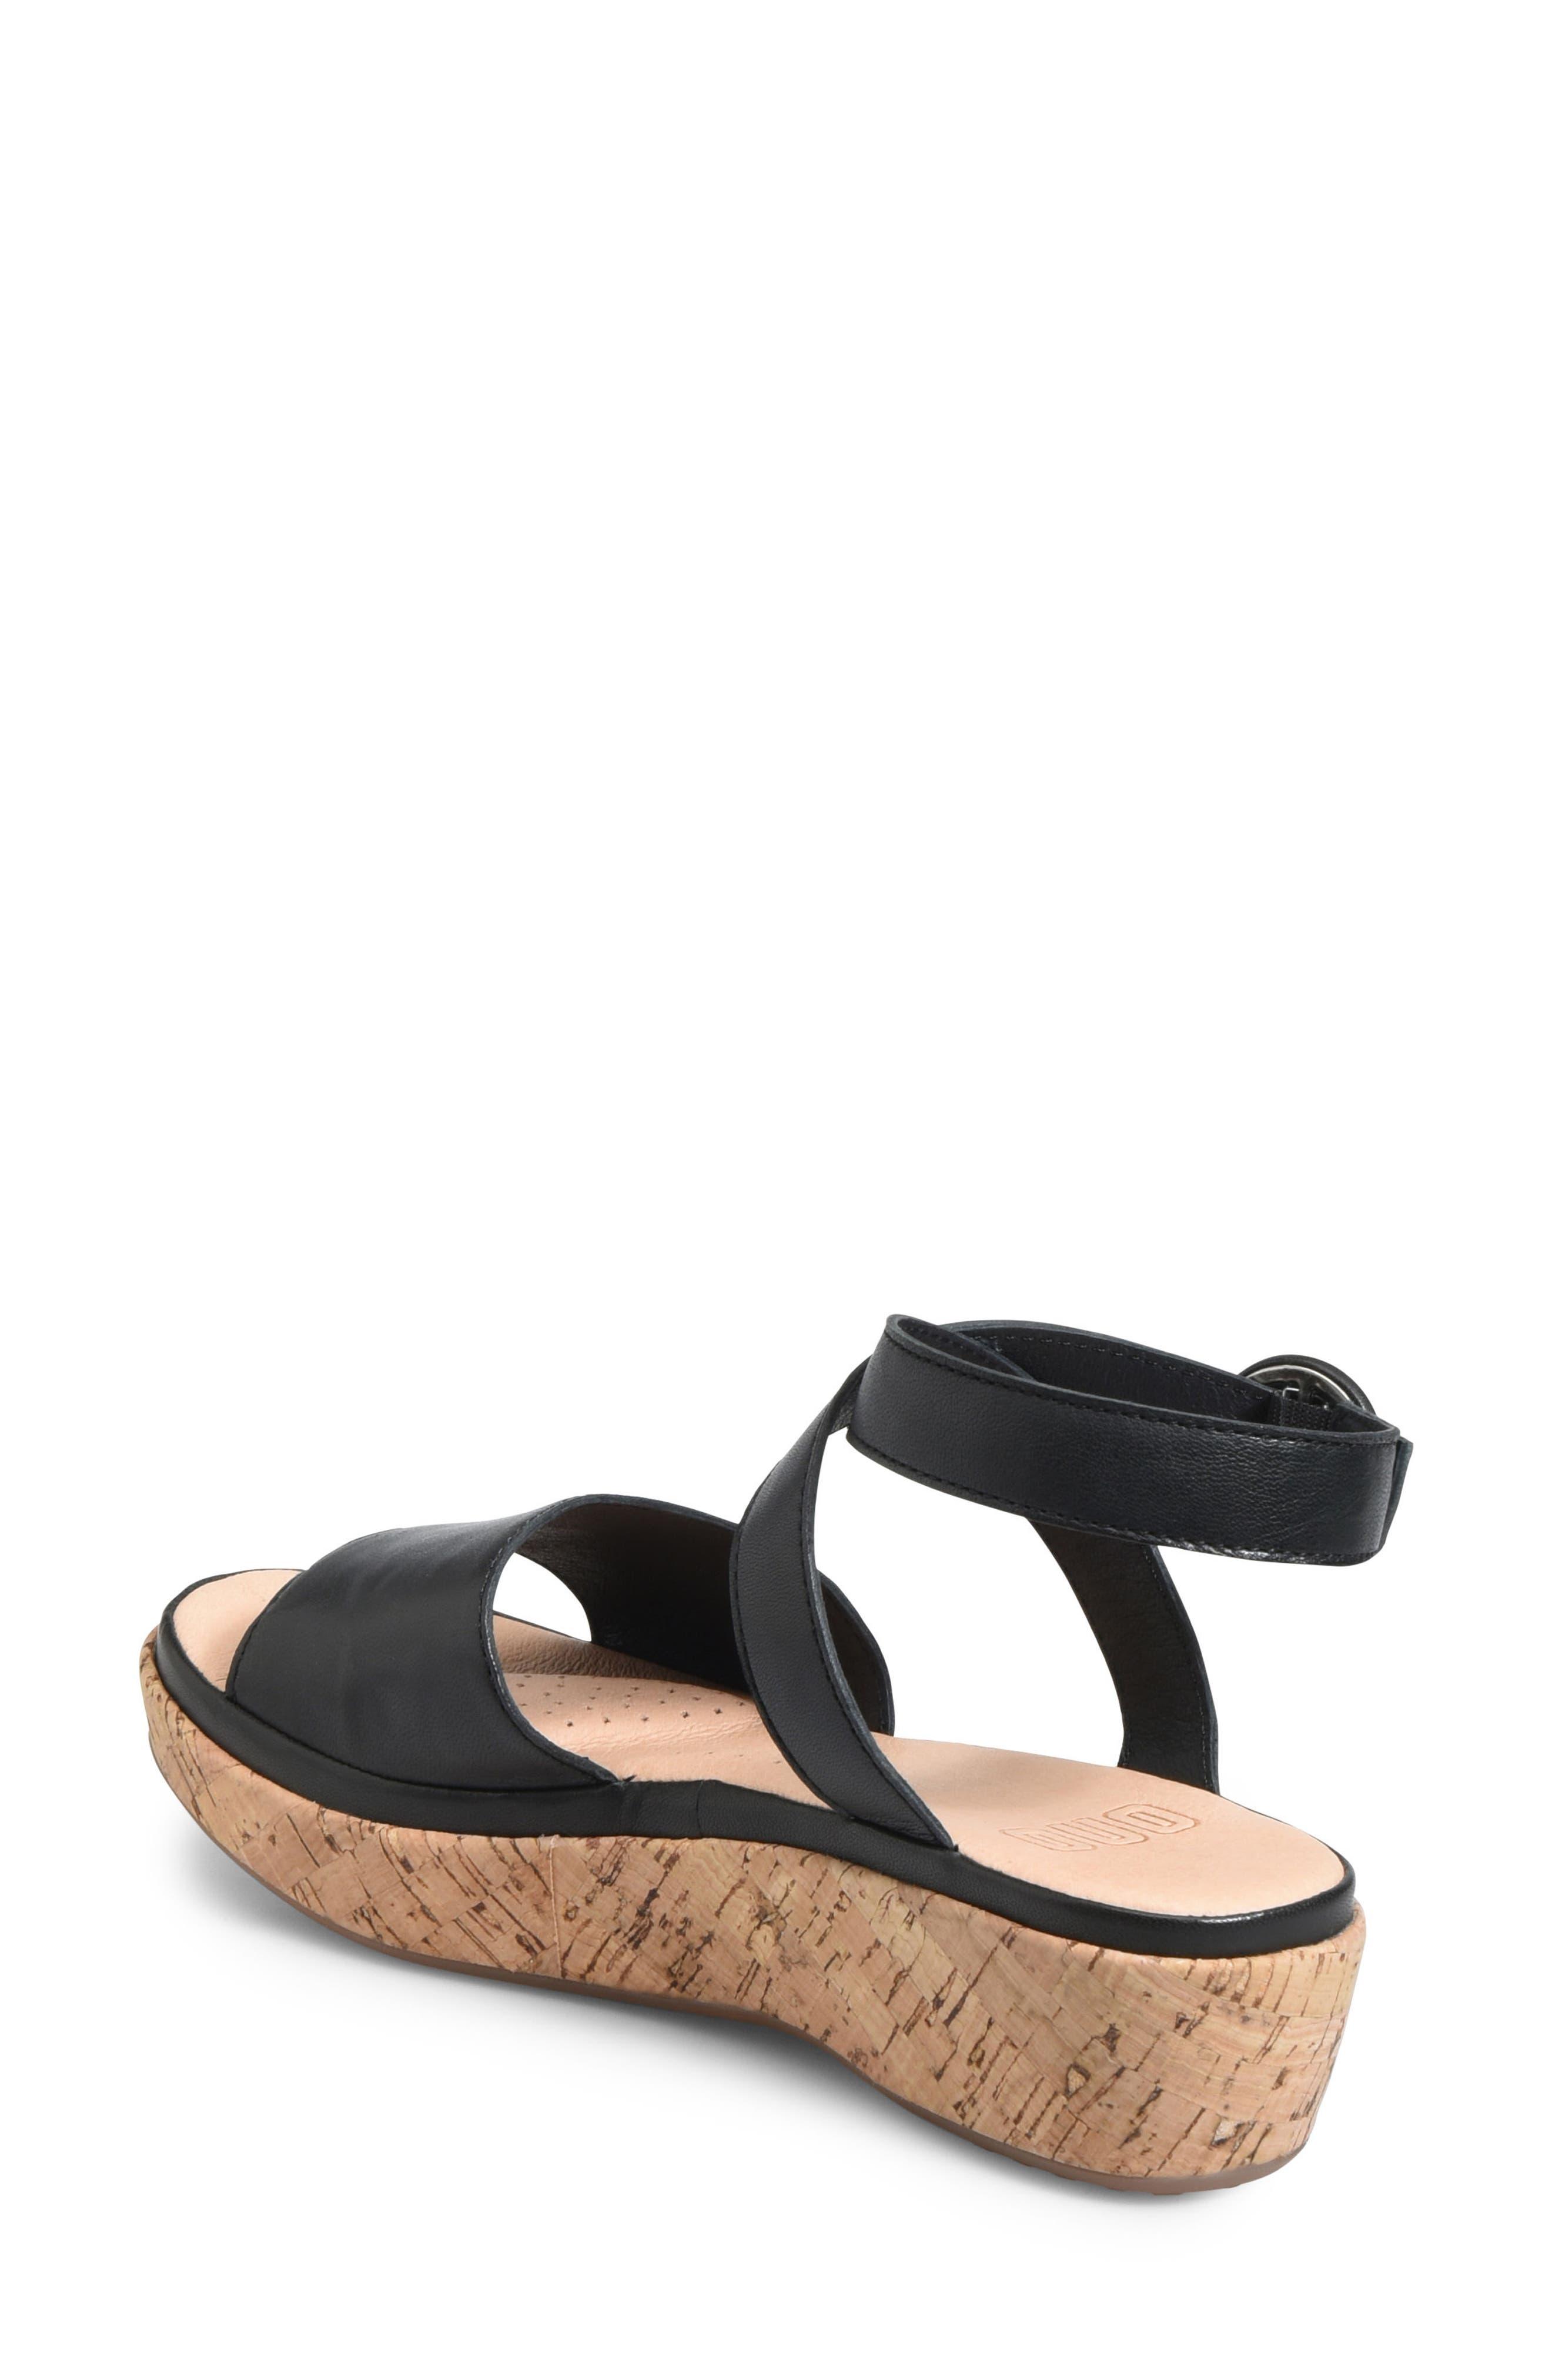 Dreamy Platform Wedge Sandal,                             Alternate thumbnail 2, color,                             Black Leather